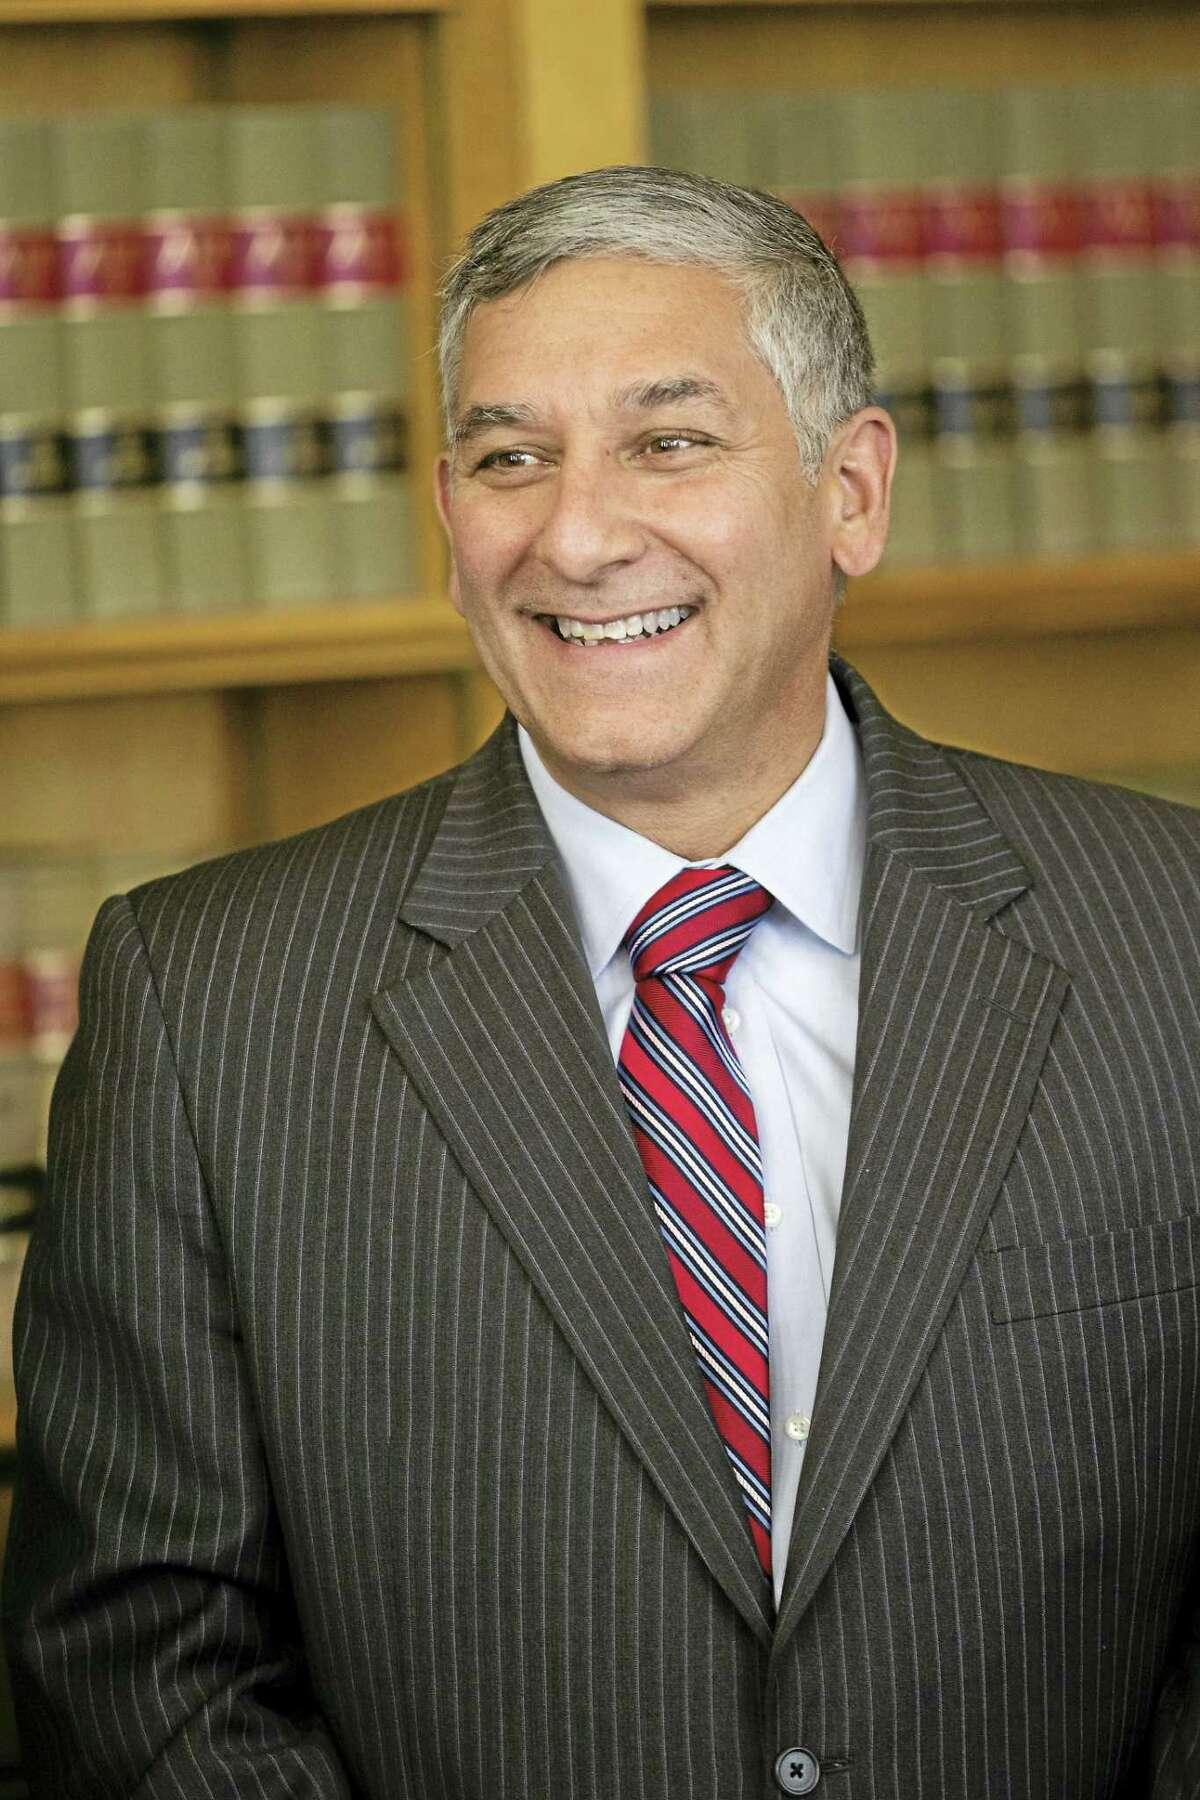 State Senate Minority Leader Len Fasano